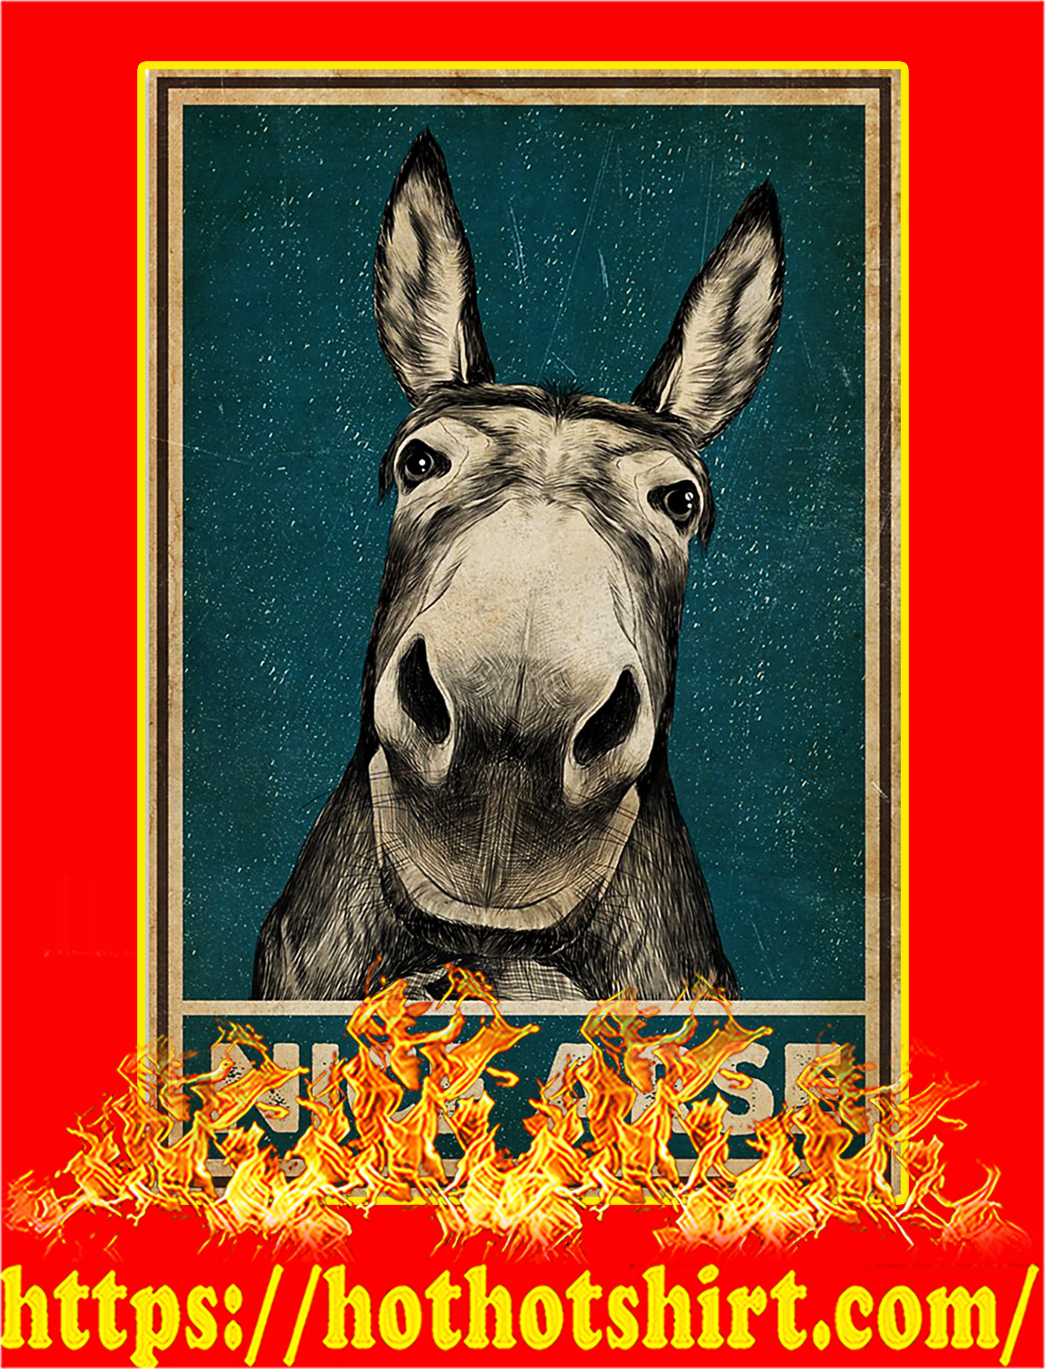 Nice arse donkey poster - A2